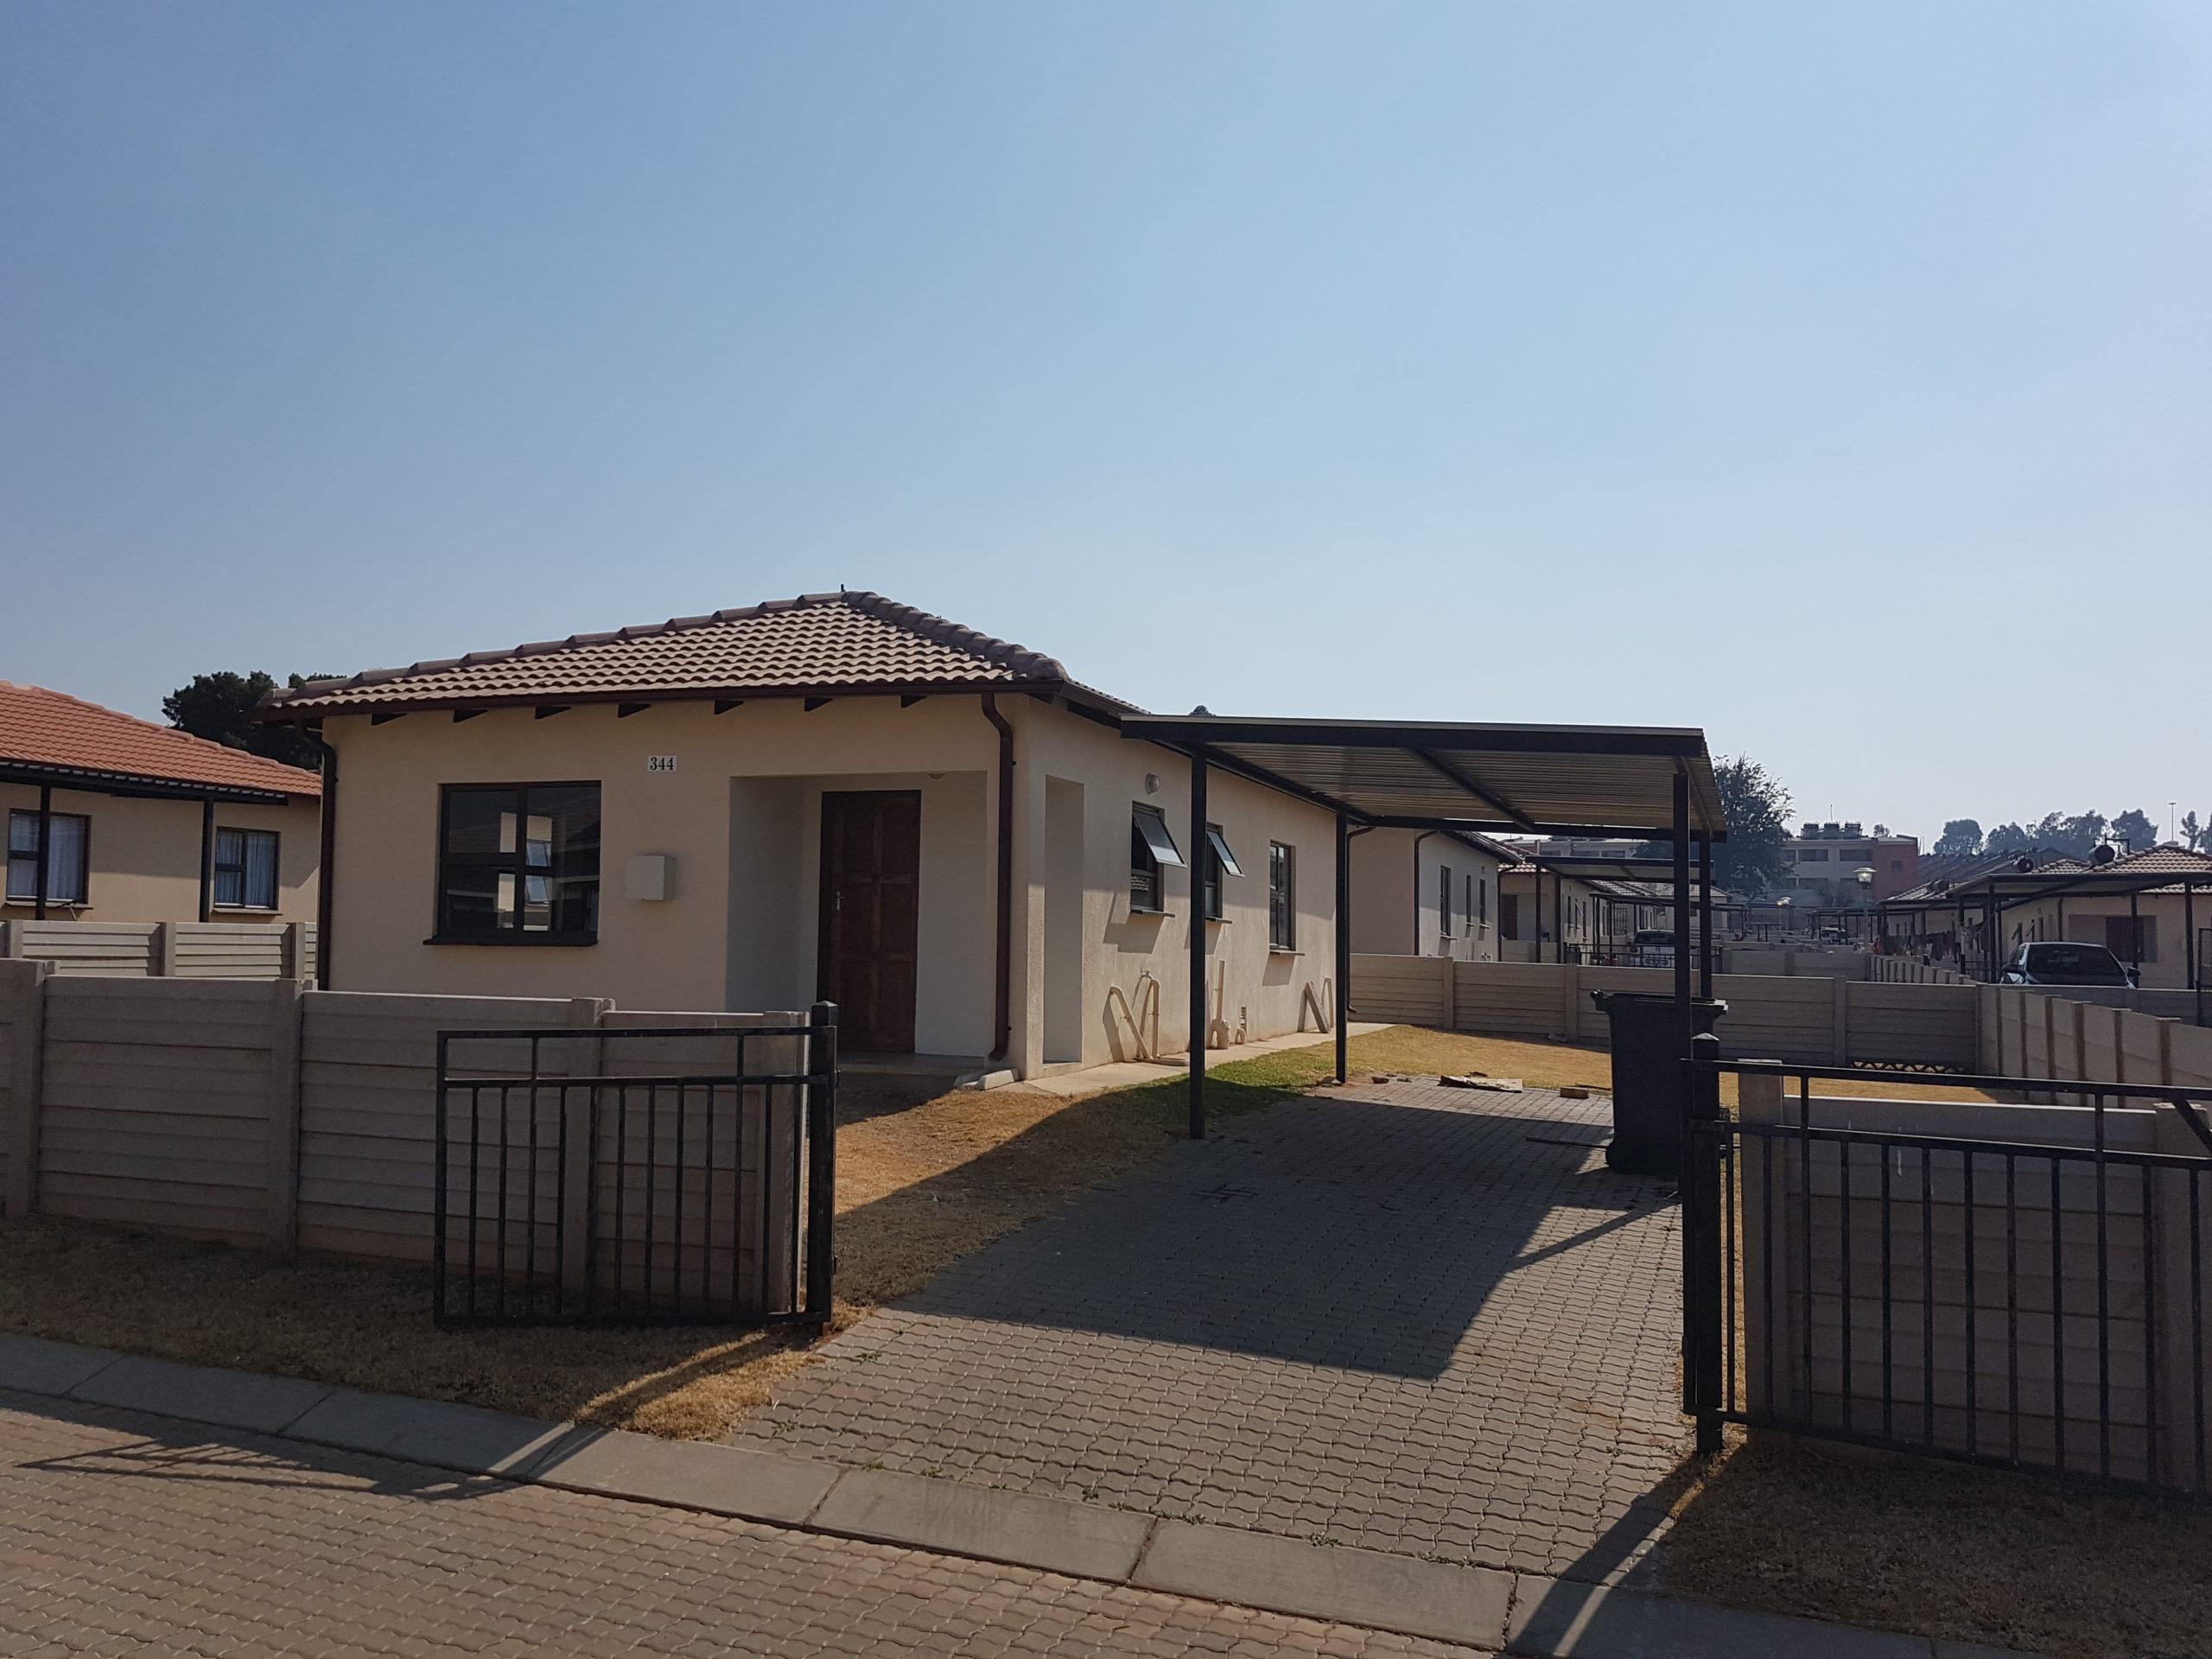 3 Bedroom, 2 Bathroom from R7950 p/m